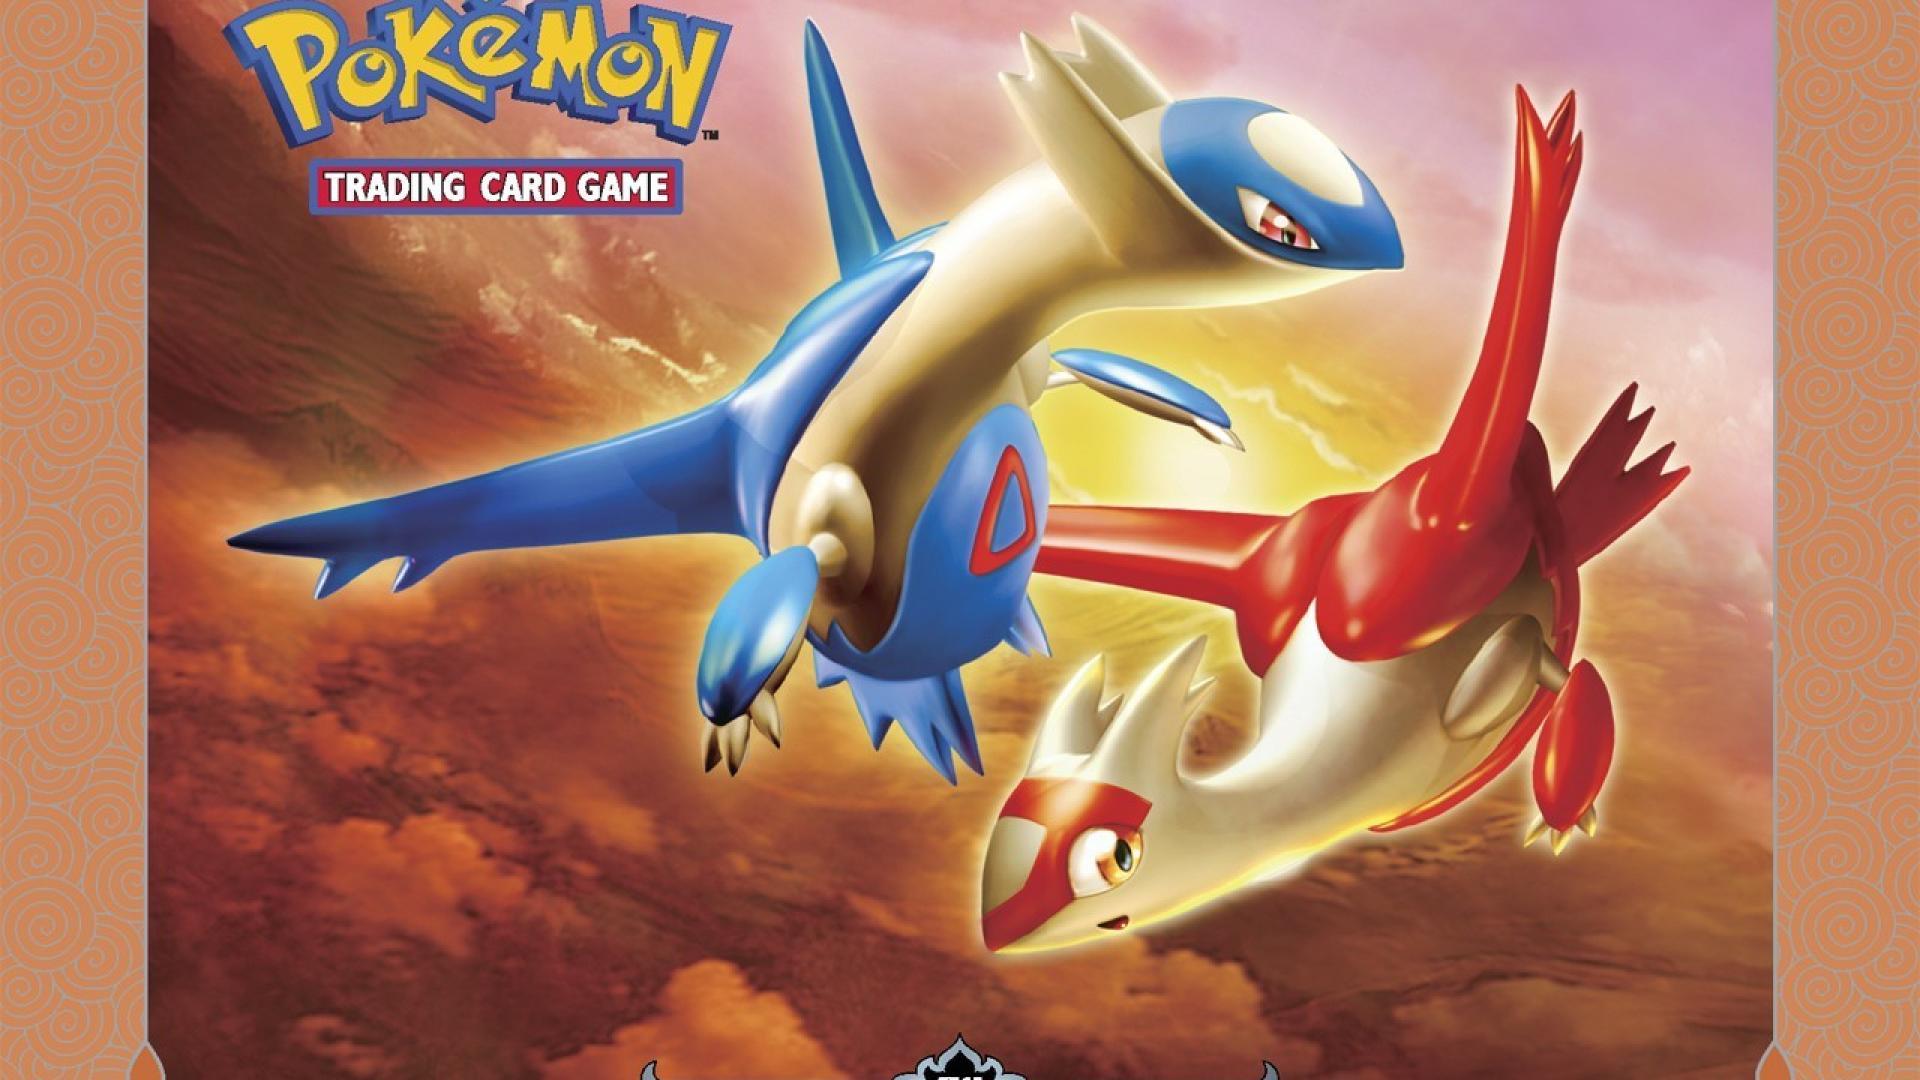 Download Pokemon latias latios wallpaper 48283 [1920x1080] 50 1920x1080